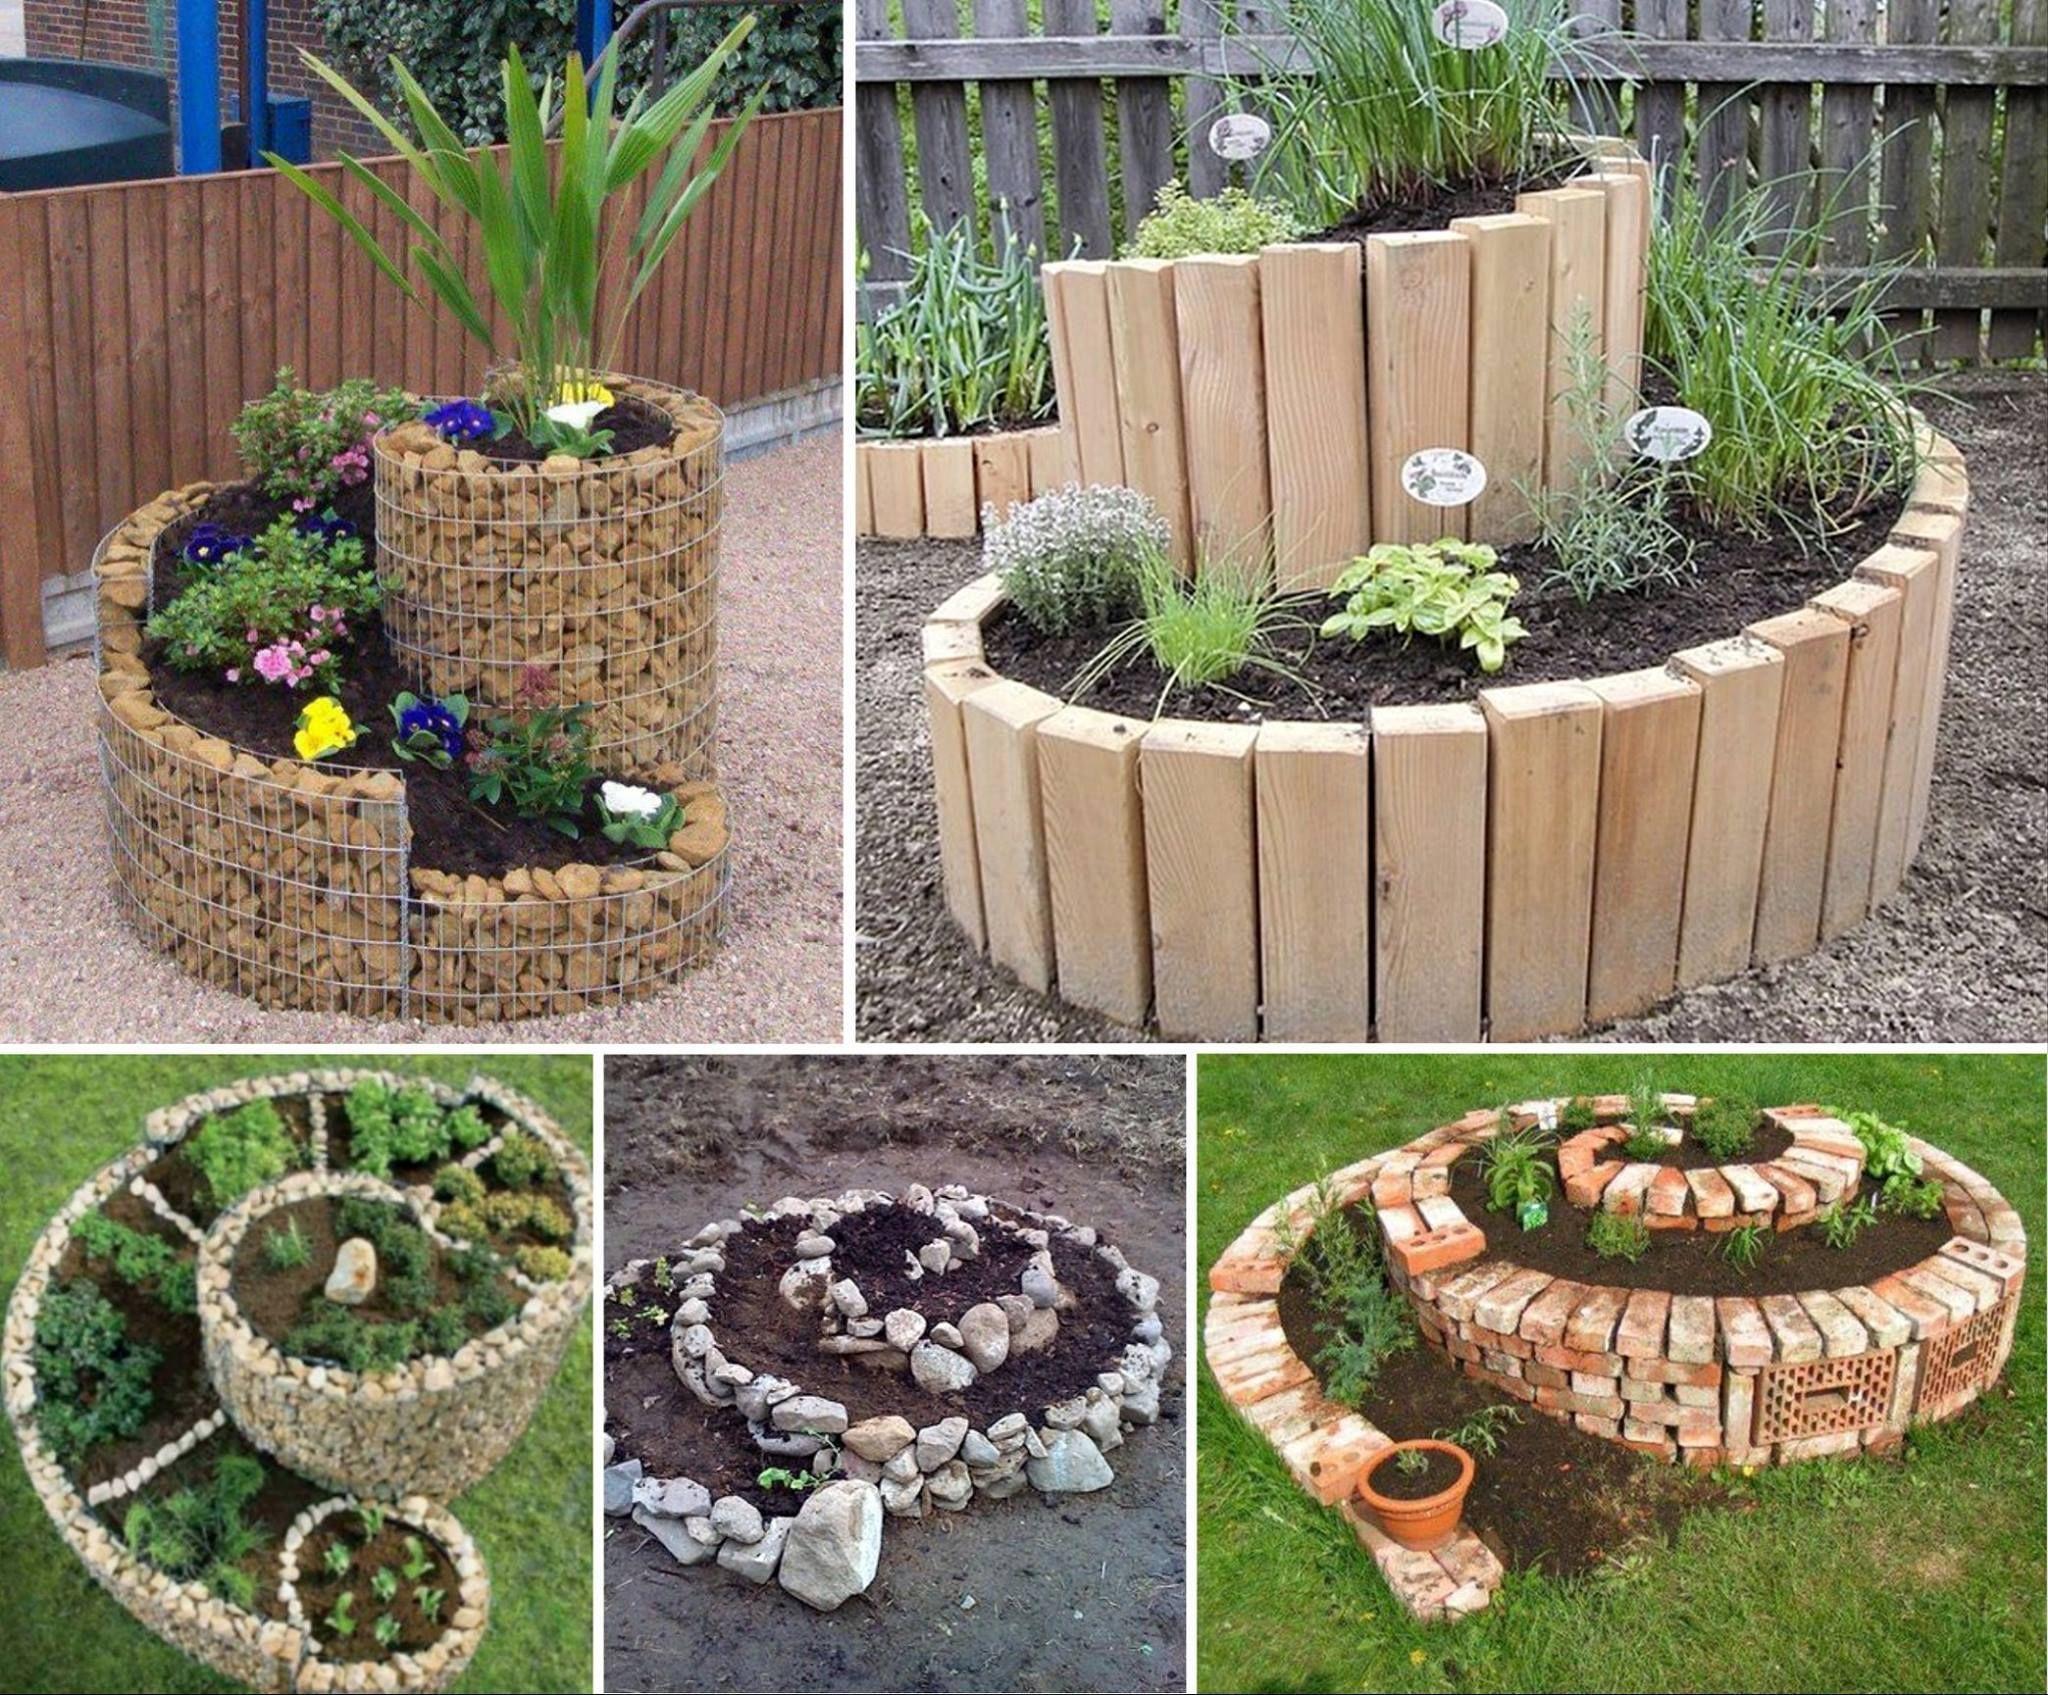 Diy Spiral Herb Gardens Pictures Photos And Images For Facebook Tumblr Pinterest And Twitter Garten Garten Hochbeet Garten Pflanzen